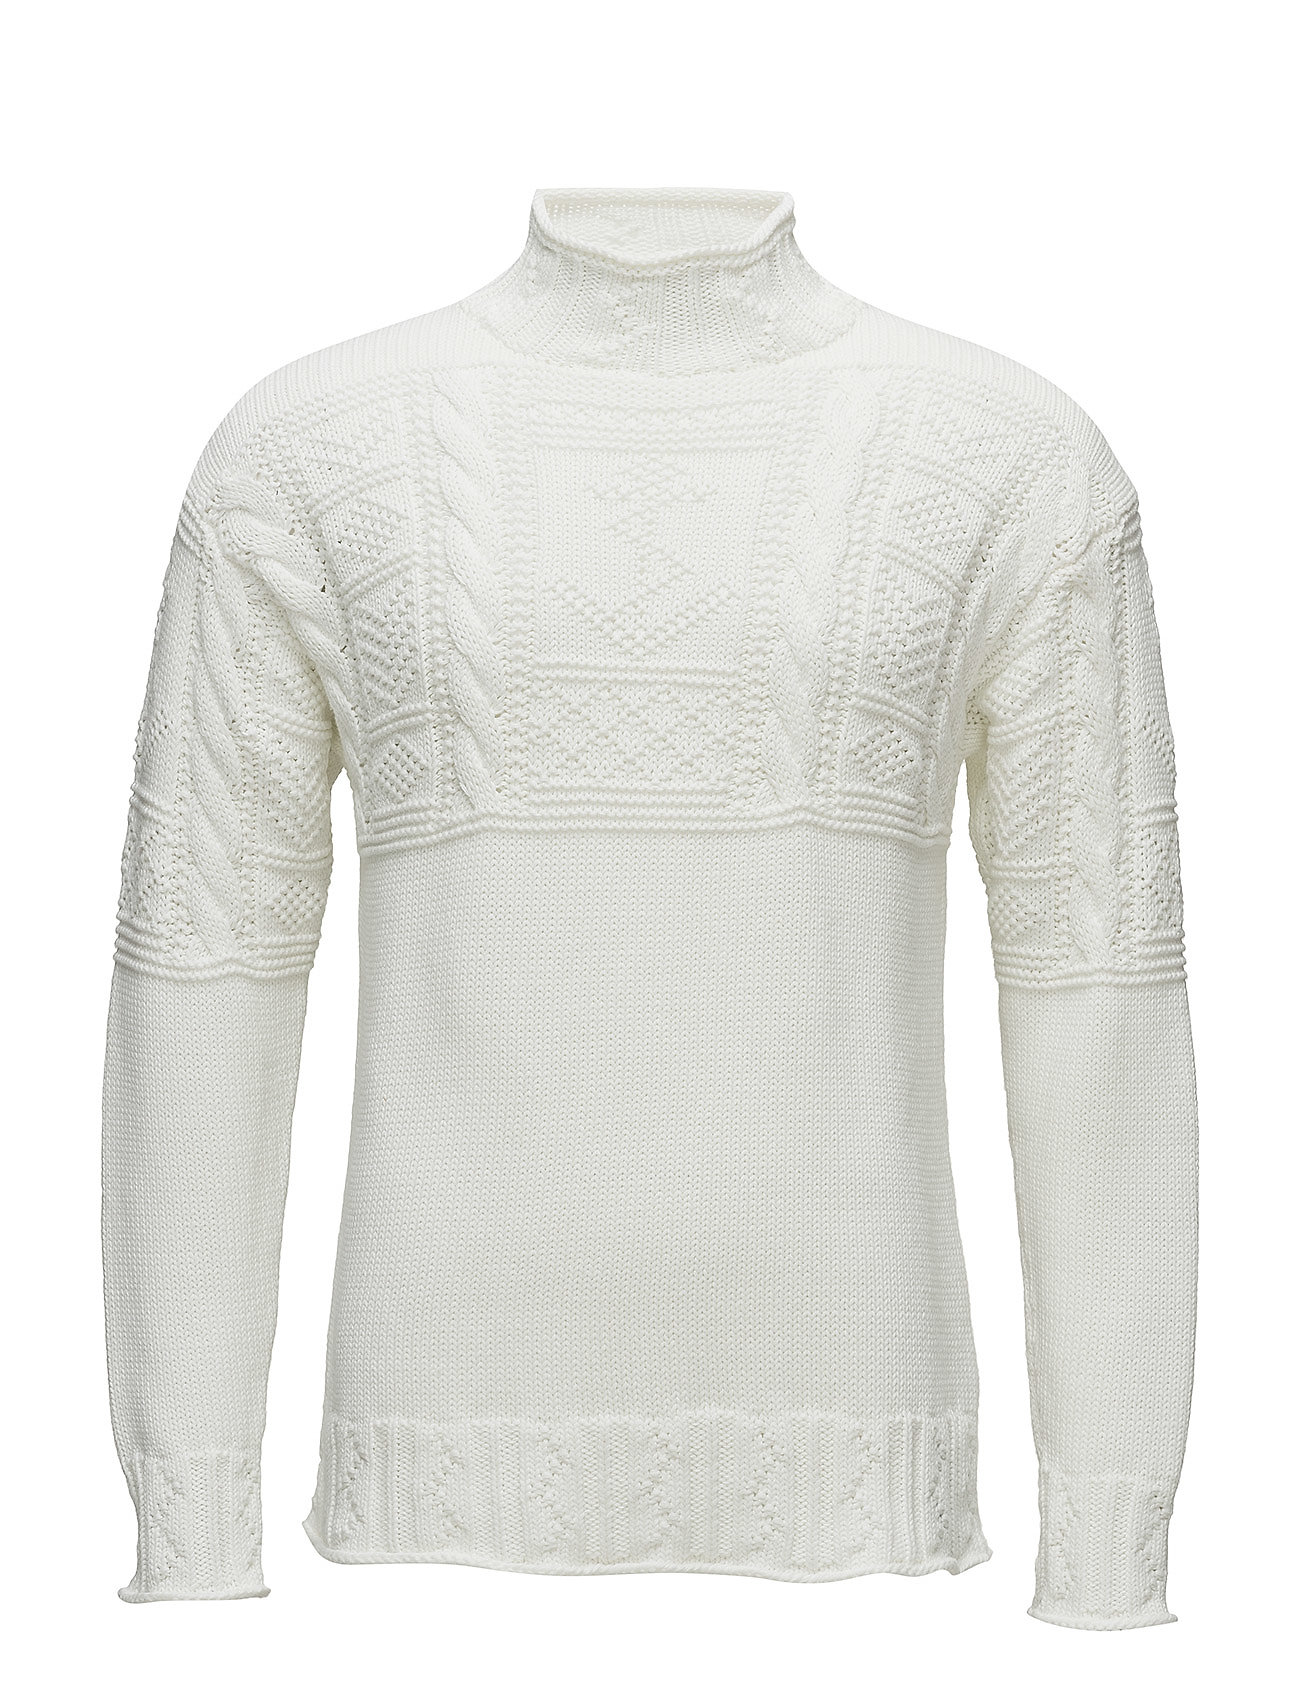 Polo Ralph Lauren ARANCABLE-LONGSLEEVE-SWEATER - WHITE